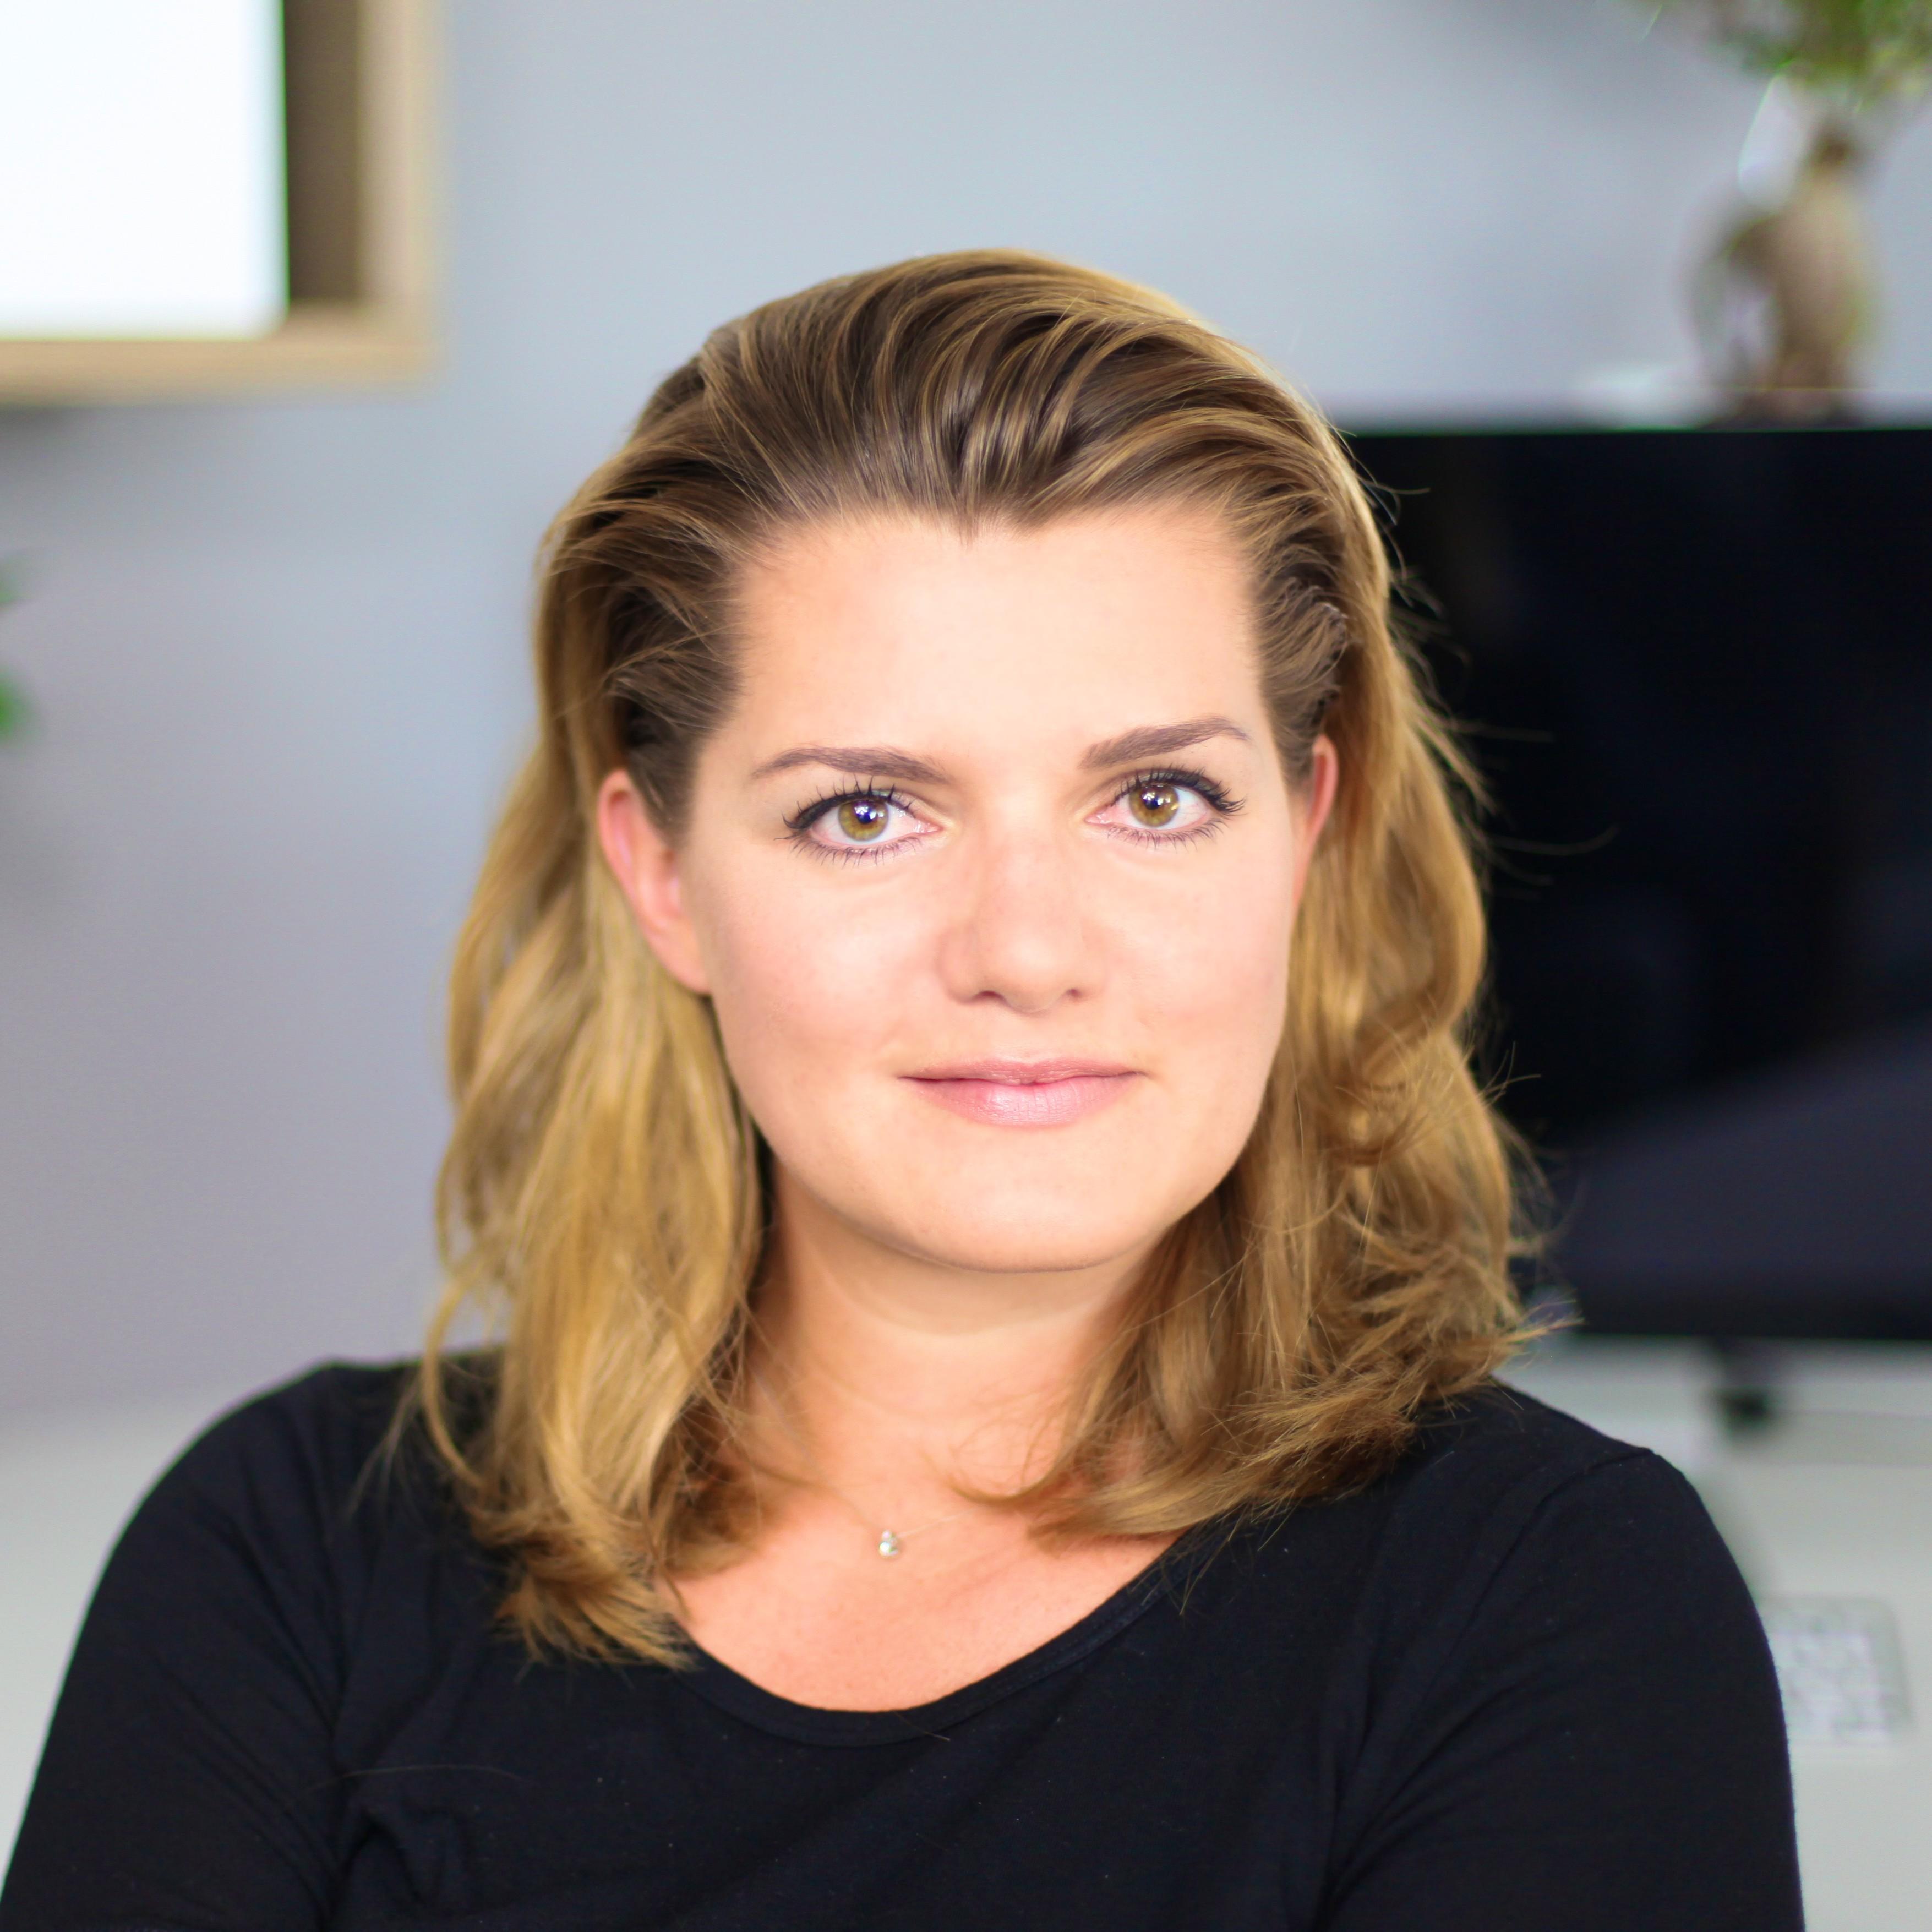 Nina Kecht